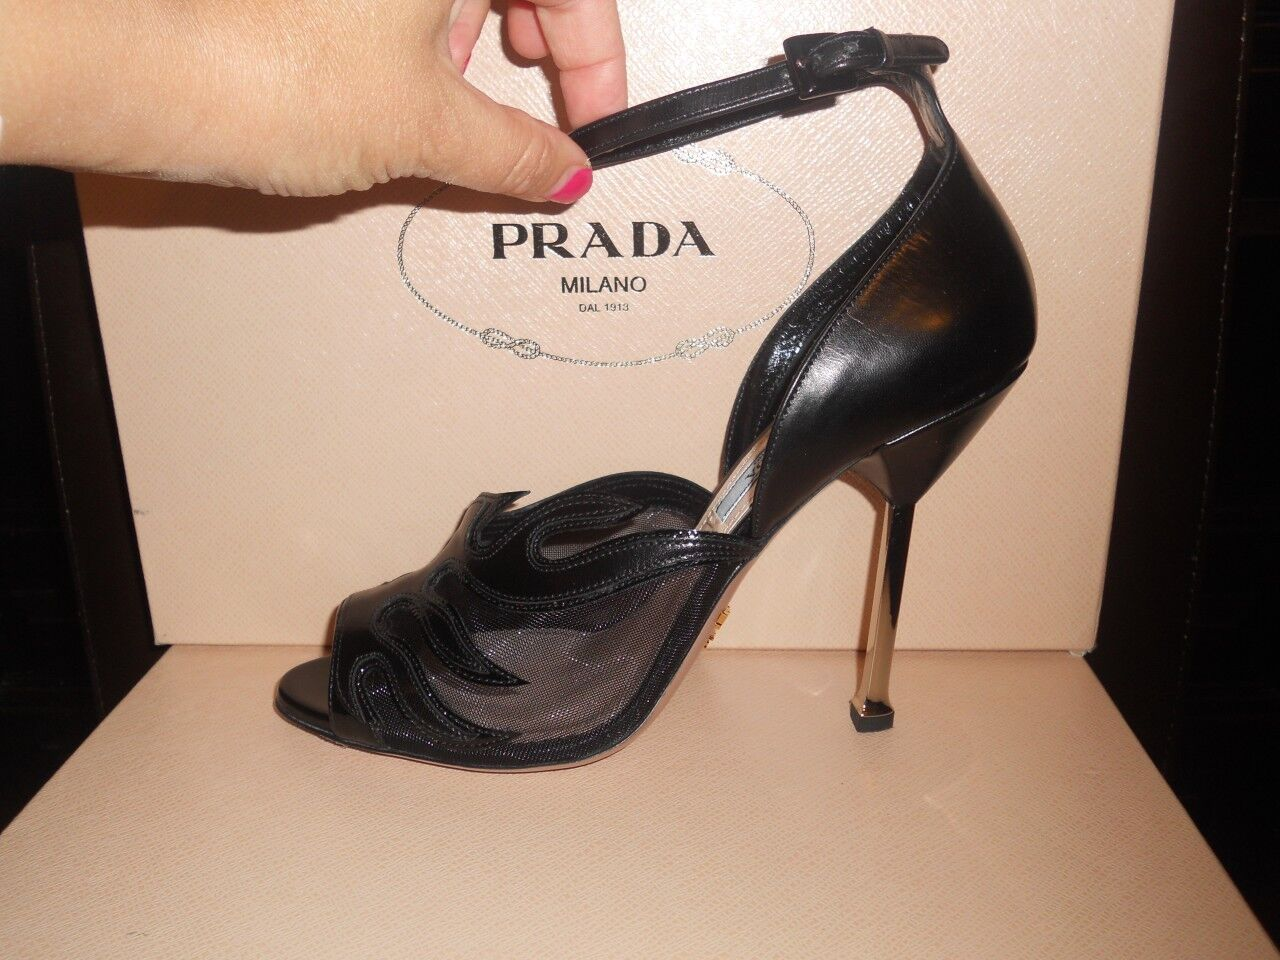 PRADA  Hot Rod  Flame Mesh Open Toe Ankle Strap Spike Heel Sandals schuhe 37.5 EU